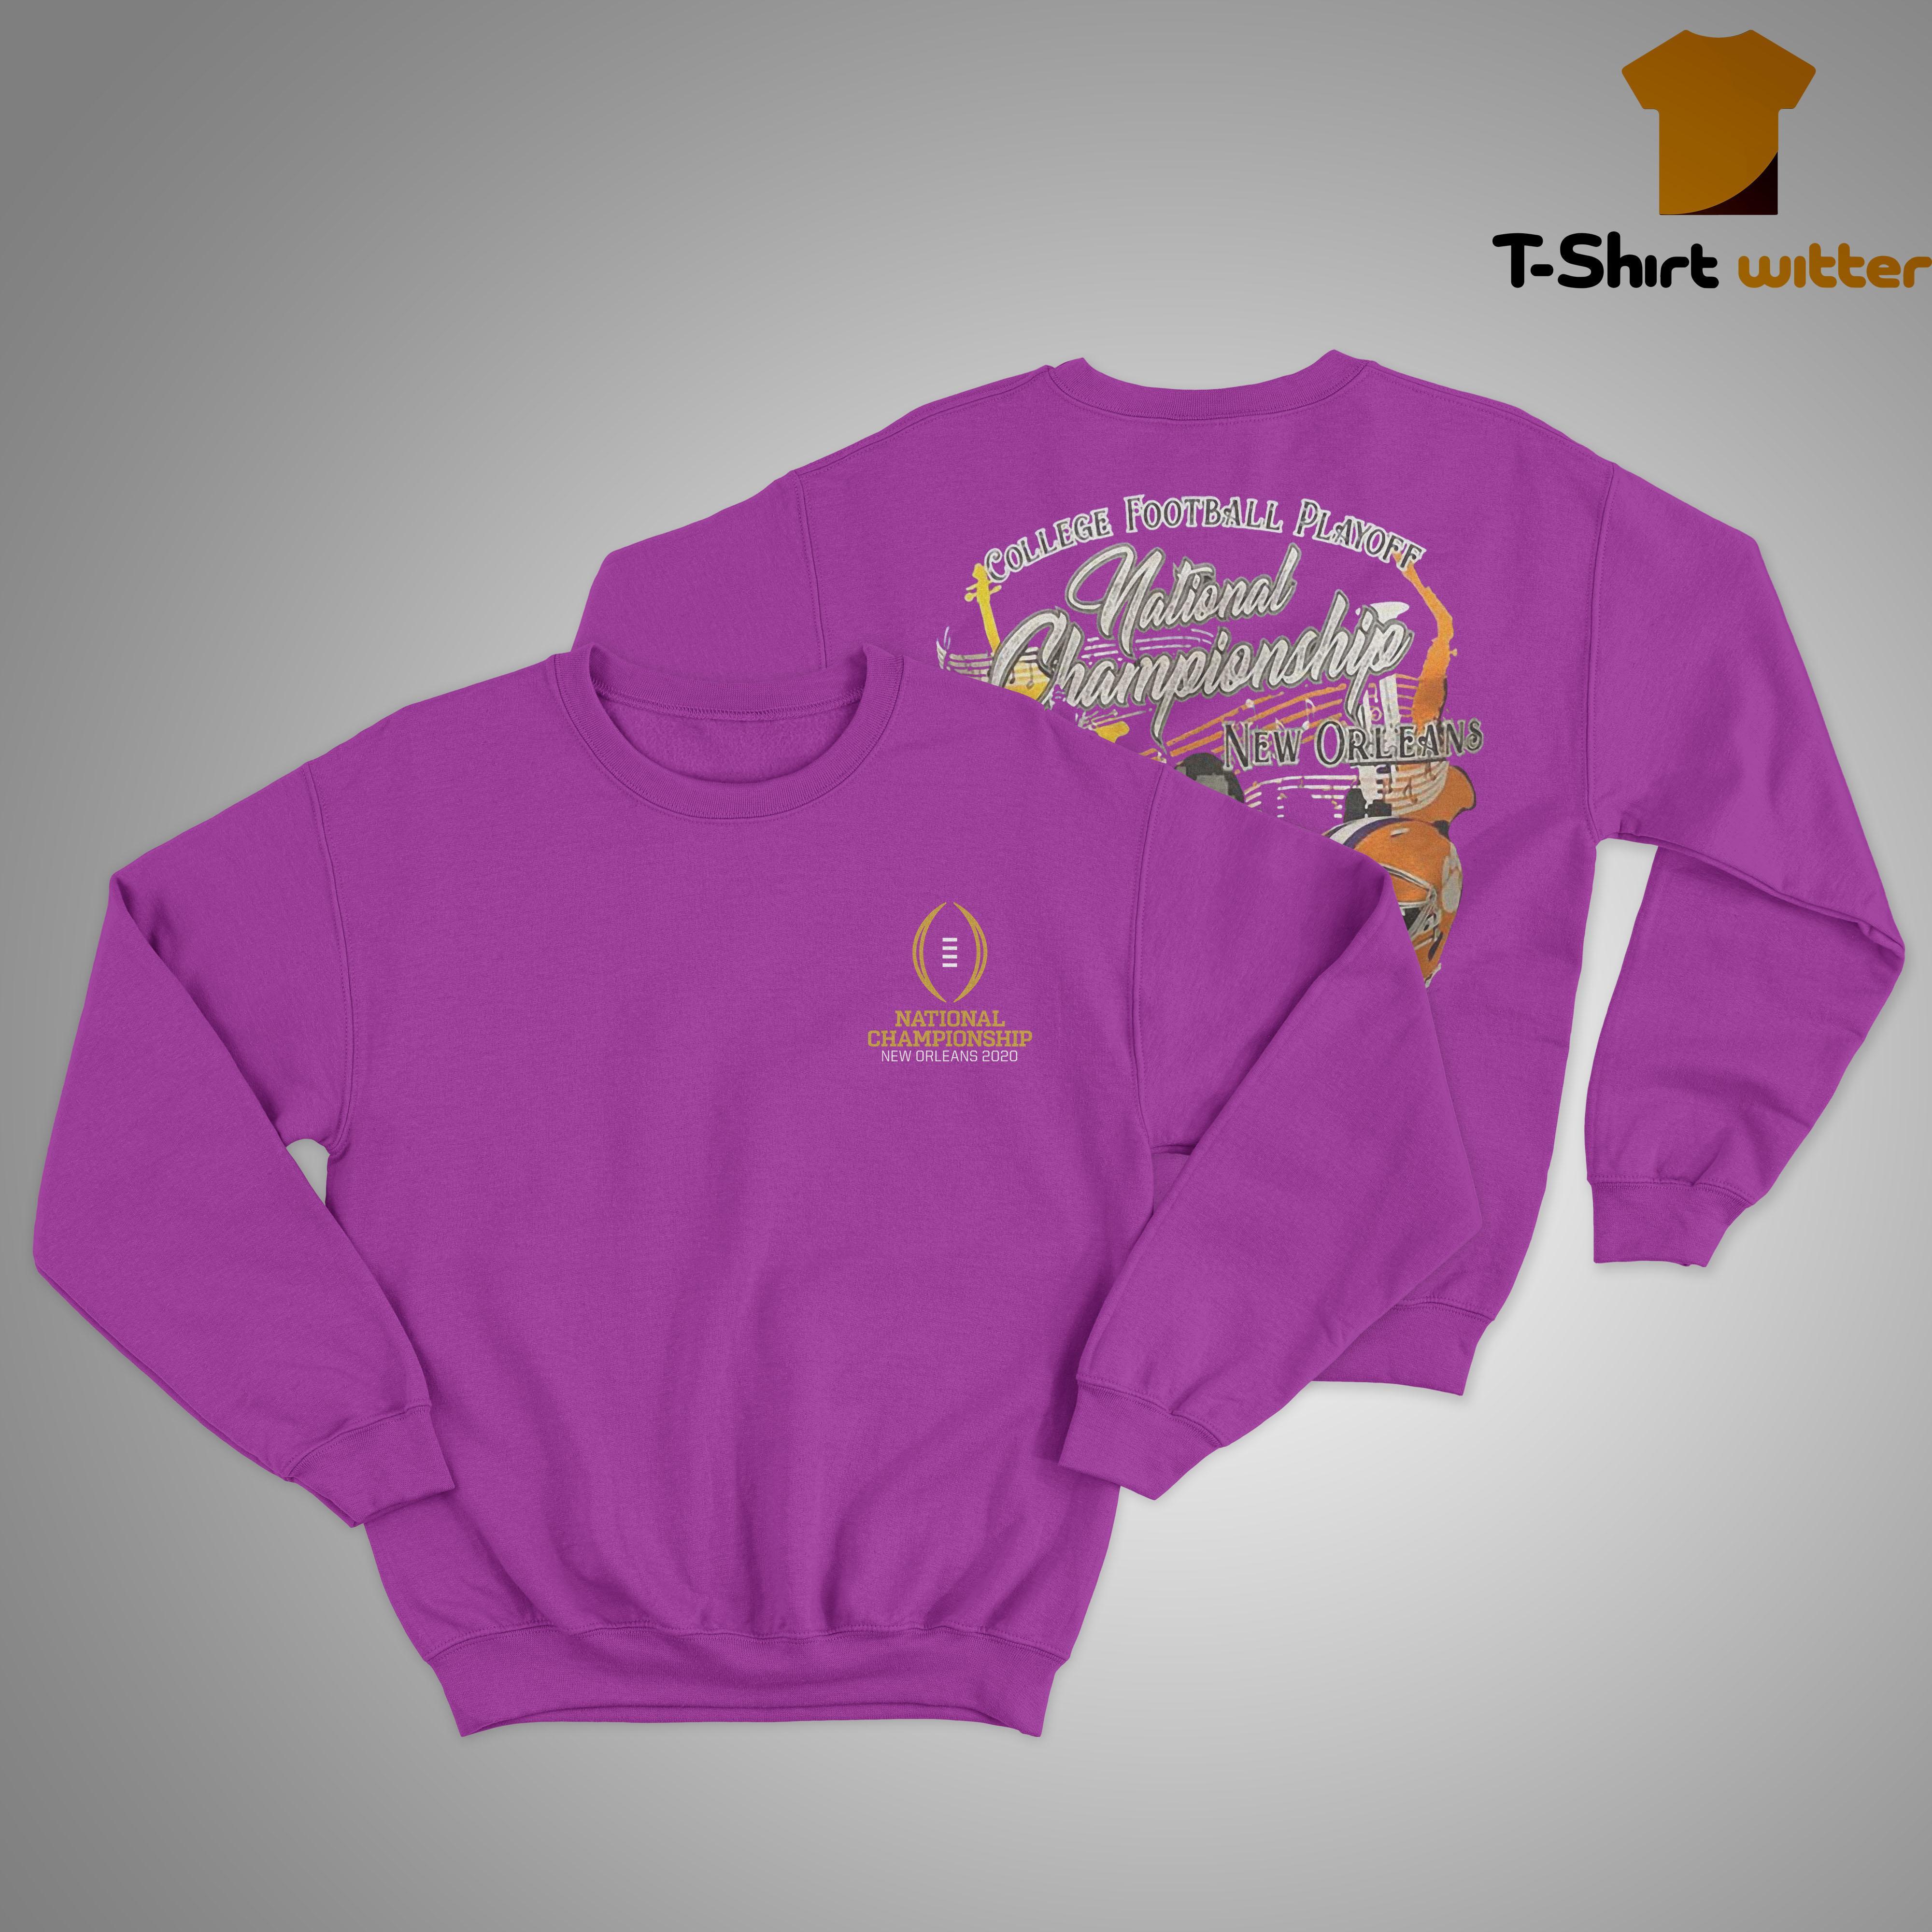 Lsu Sec Championship Game 2019 Sweater